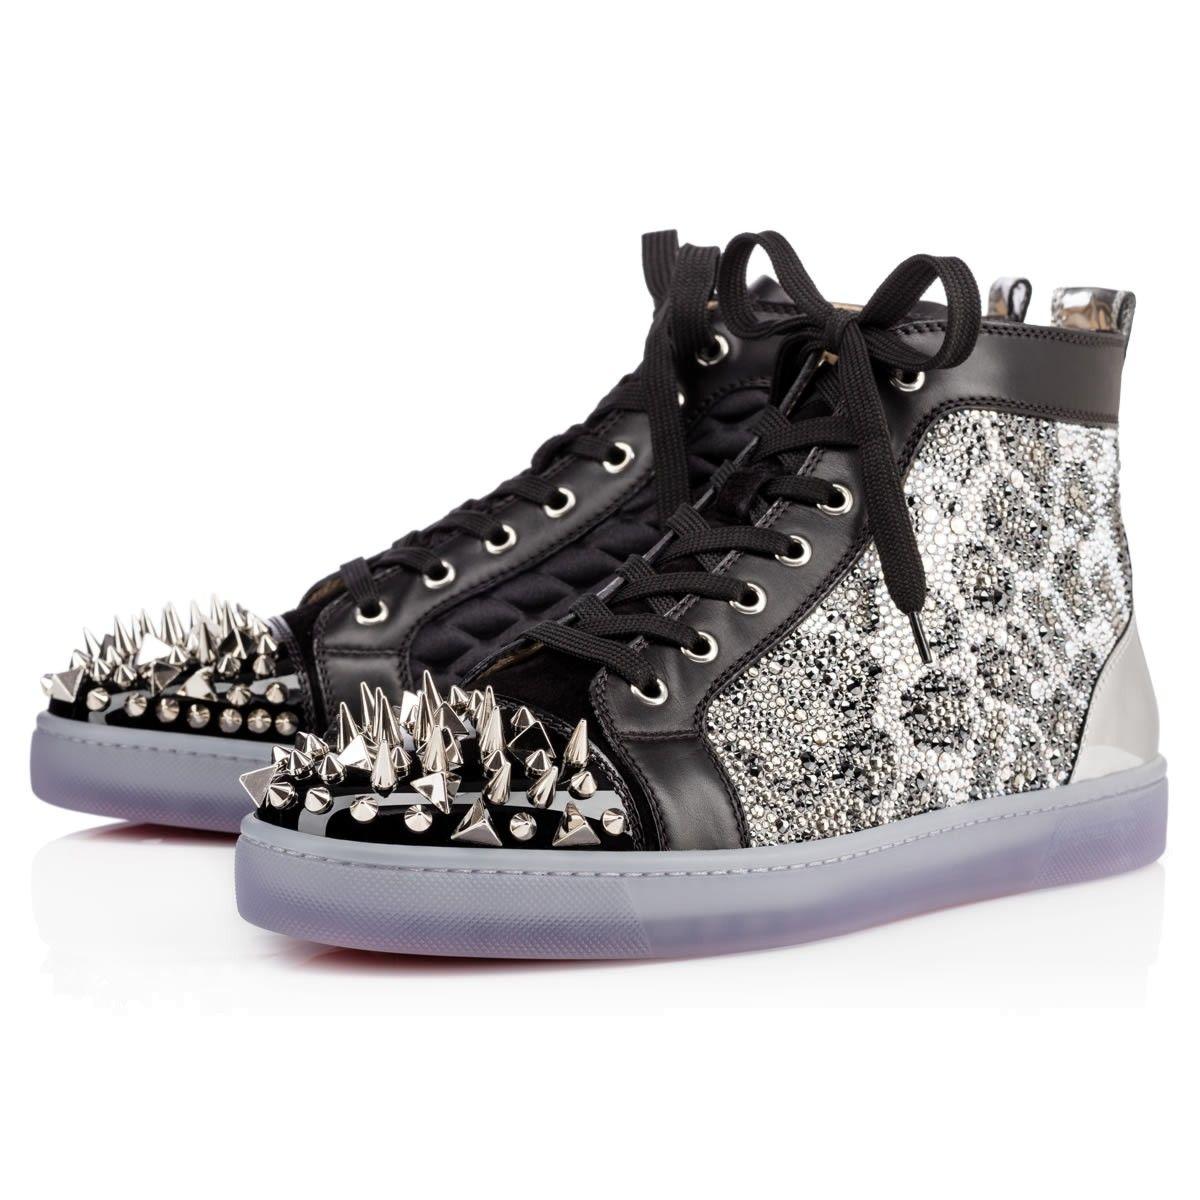 Shoes - New No Limit Men's Flat - Christian Louboutin